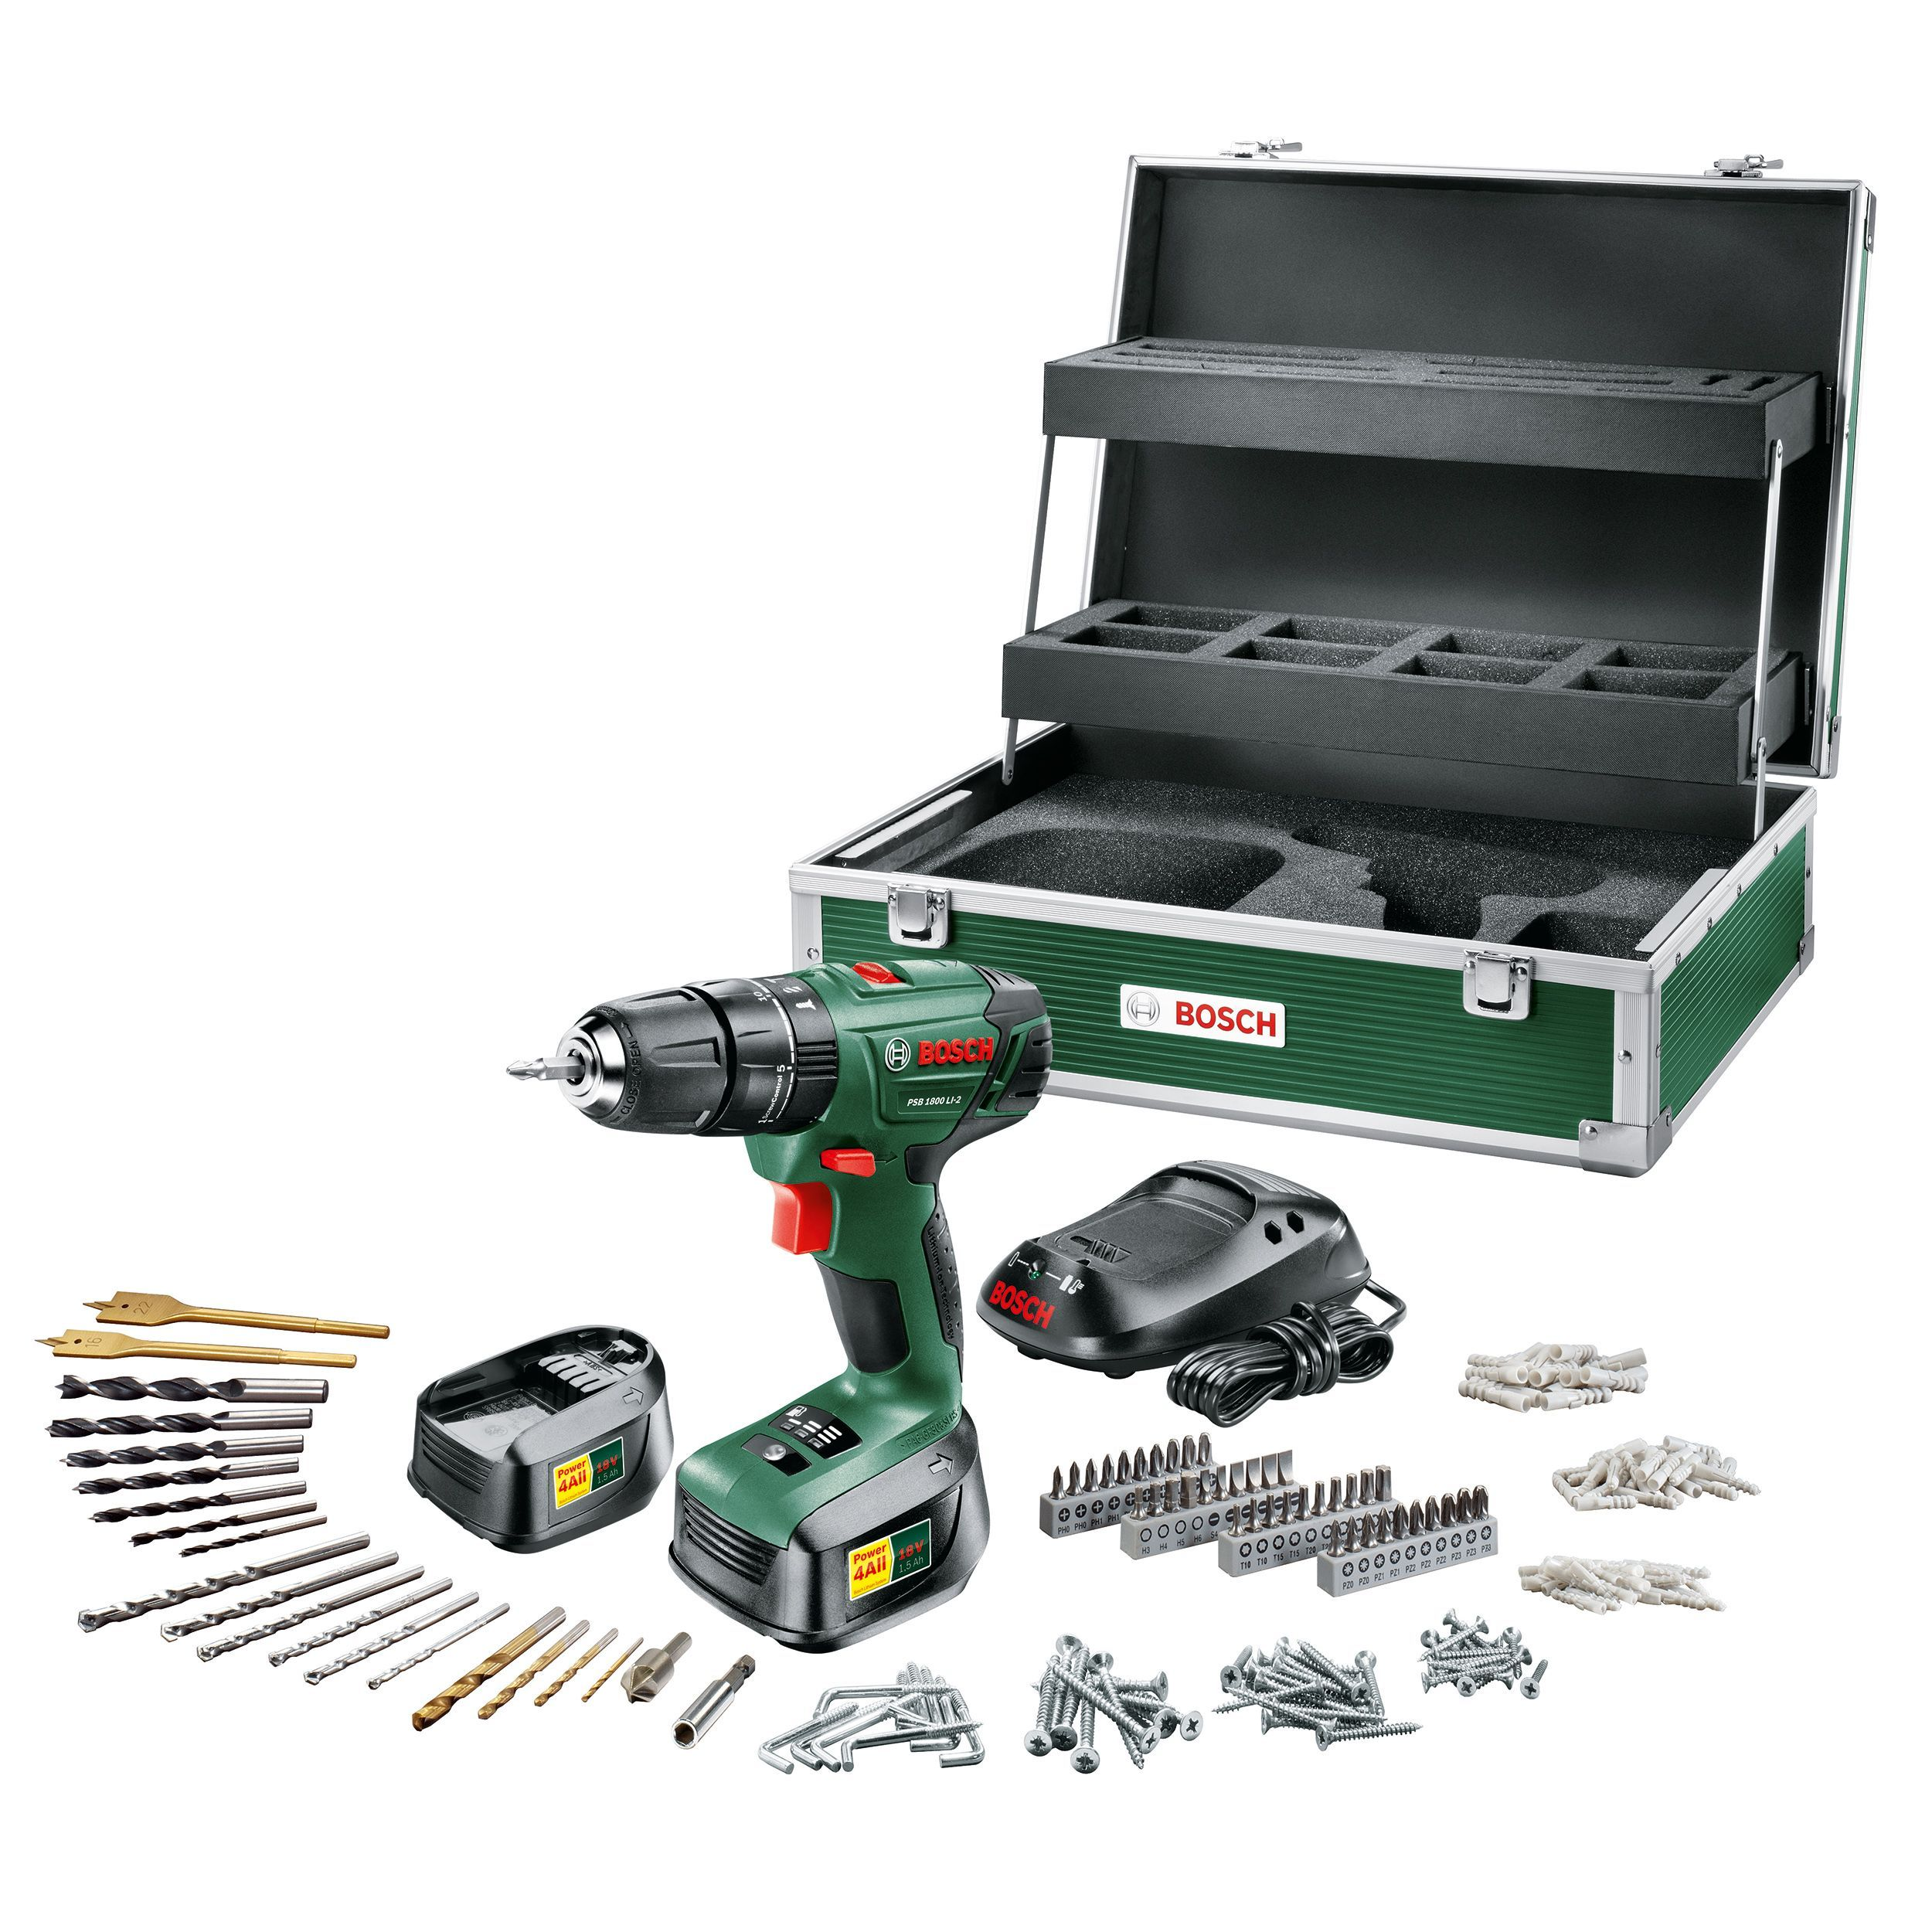 Bosch Cordless 18v Li Ion Hammer Drill 2 Batteries With Toolbox Psb 1800 Li 2 Departments Diy At B Drill Driver Drill Hammer Drill